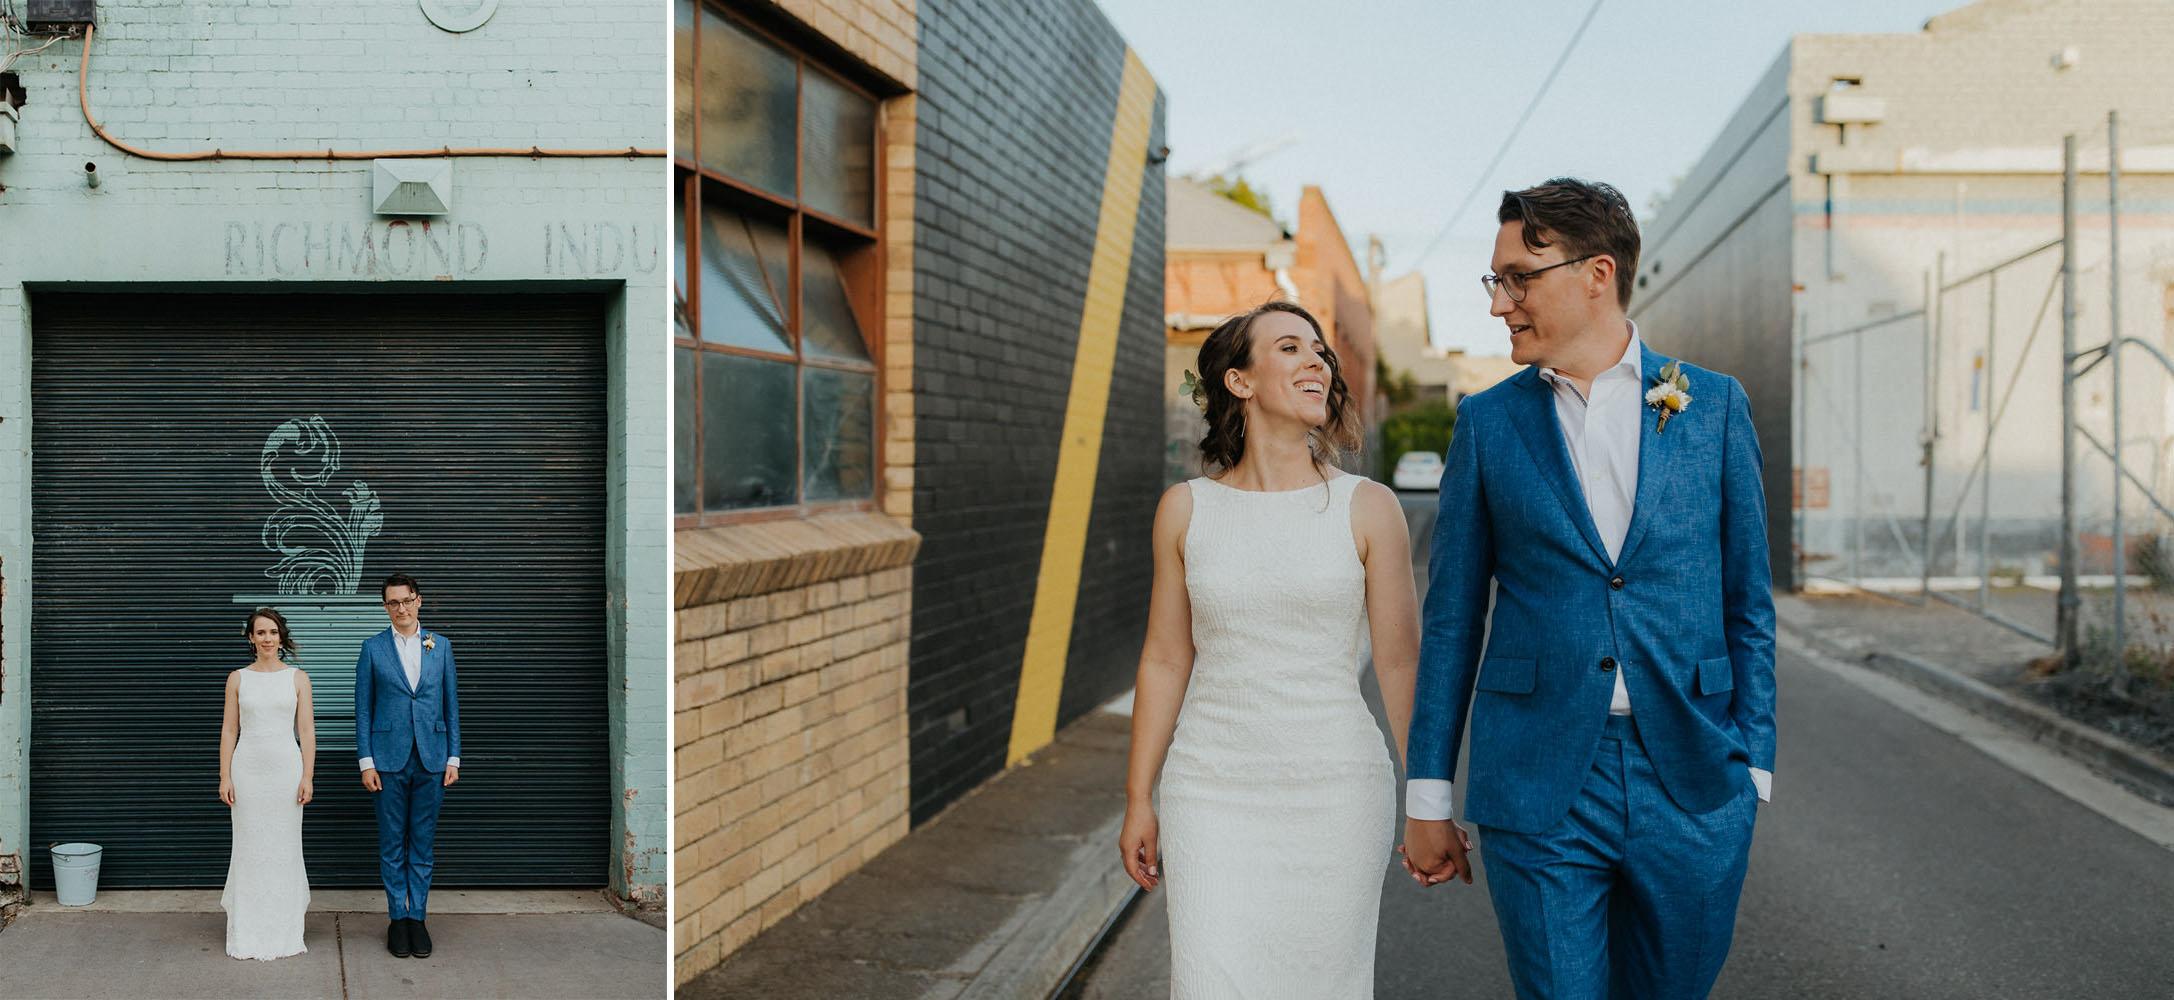 glasshaus_inside_melbourne_wedding_155(3252) copy.jpg